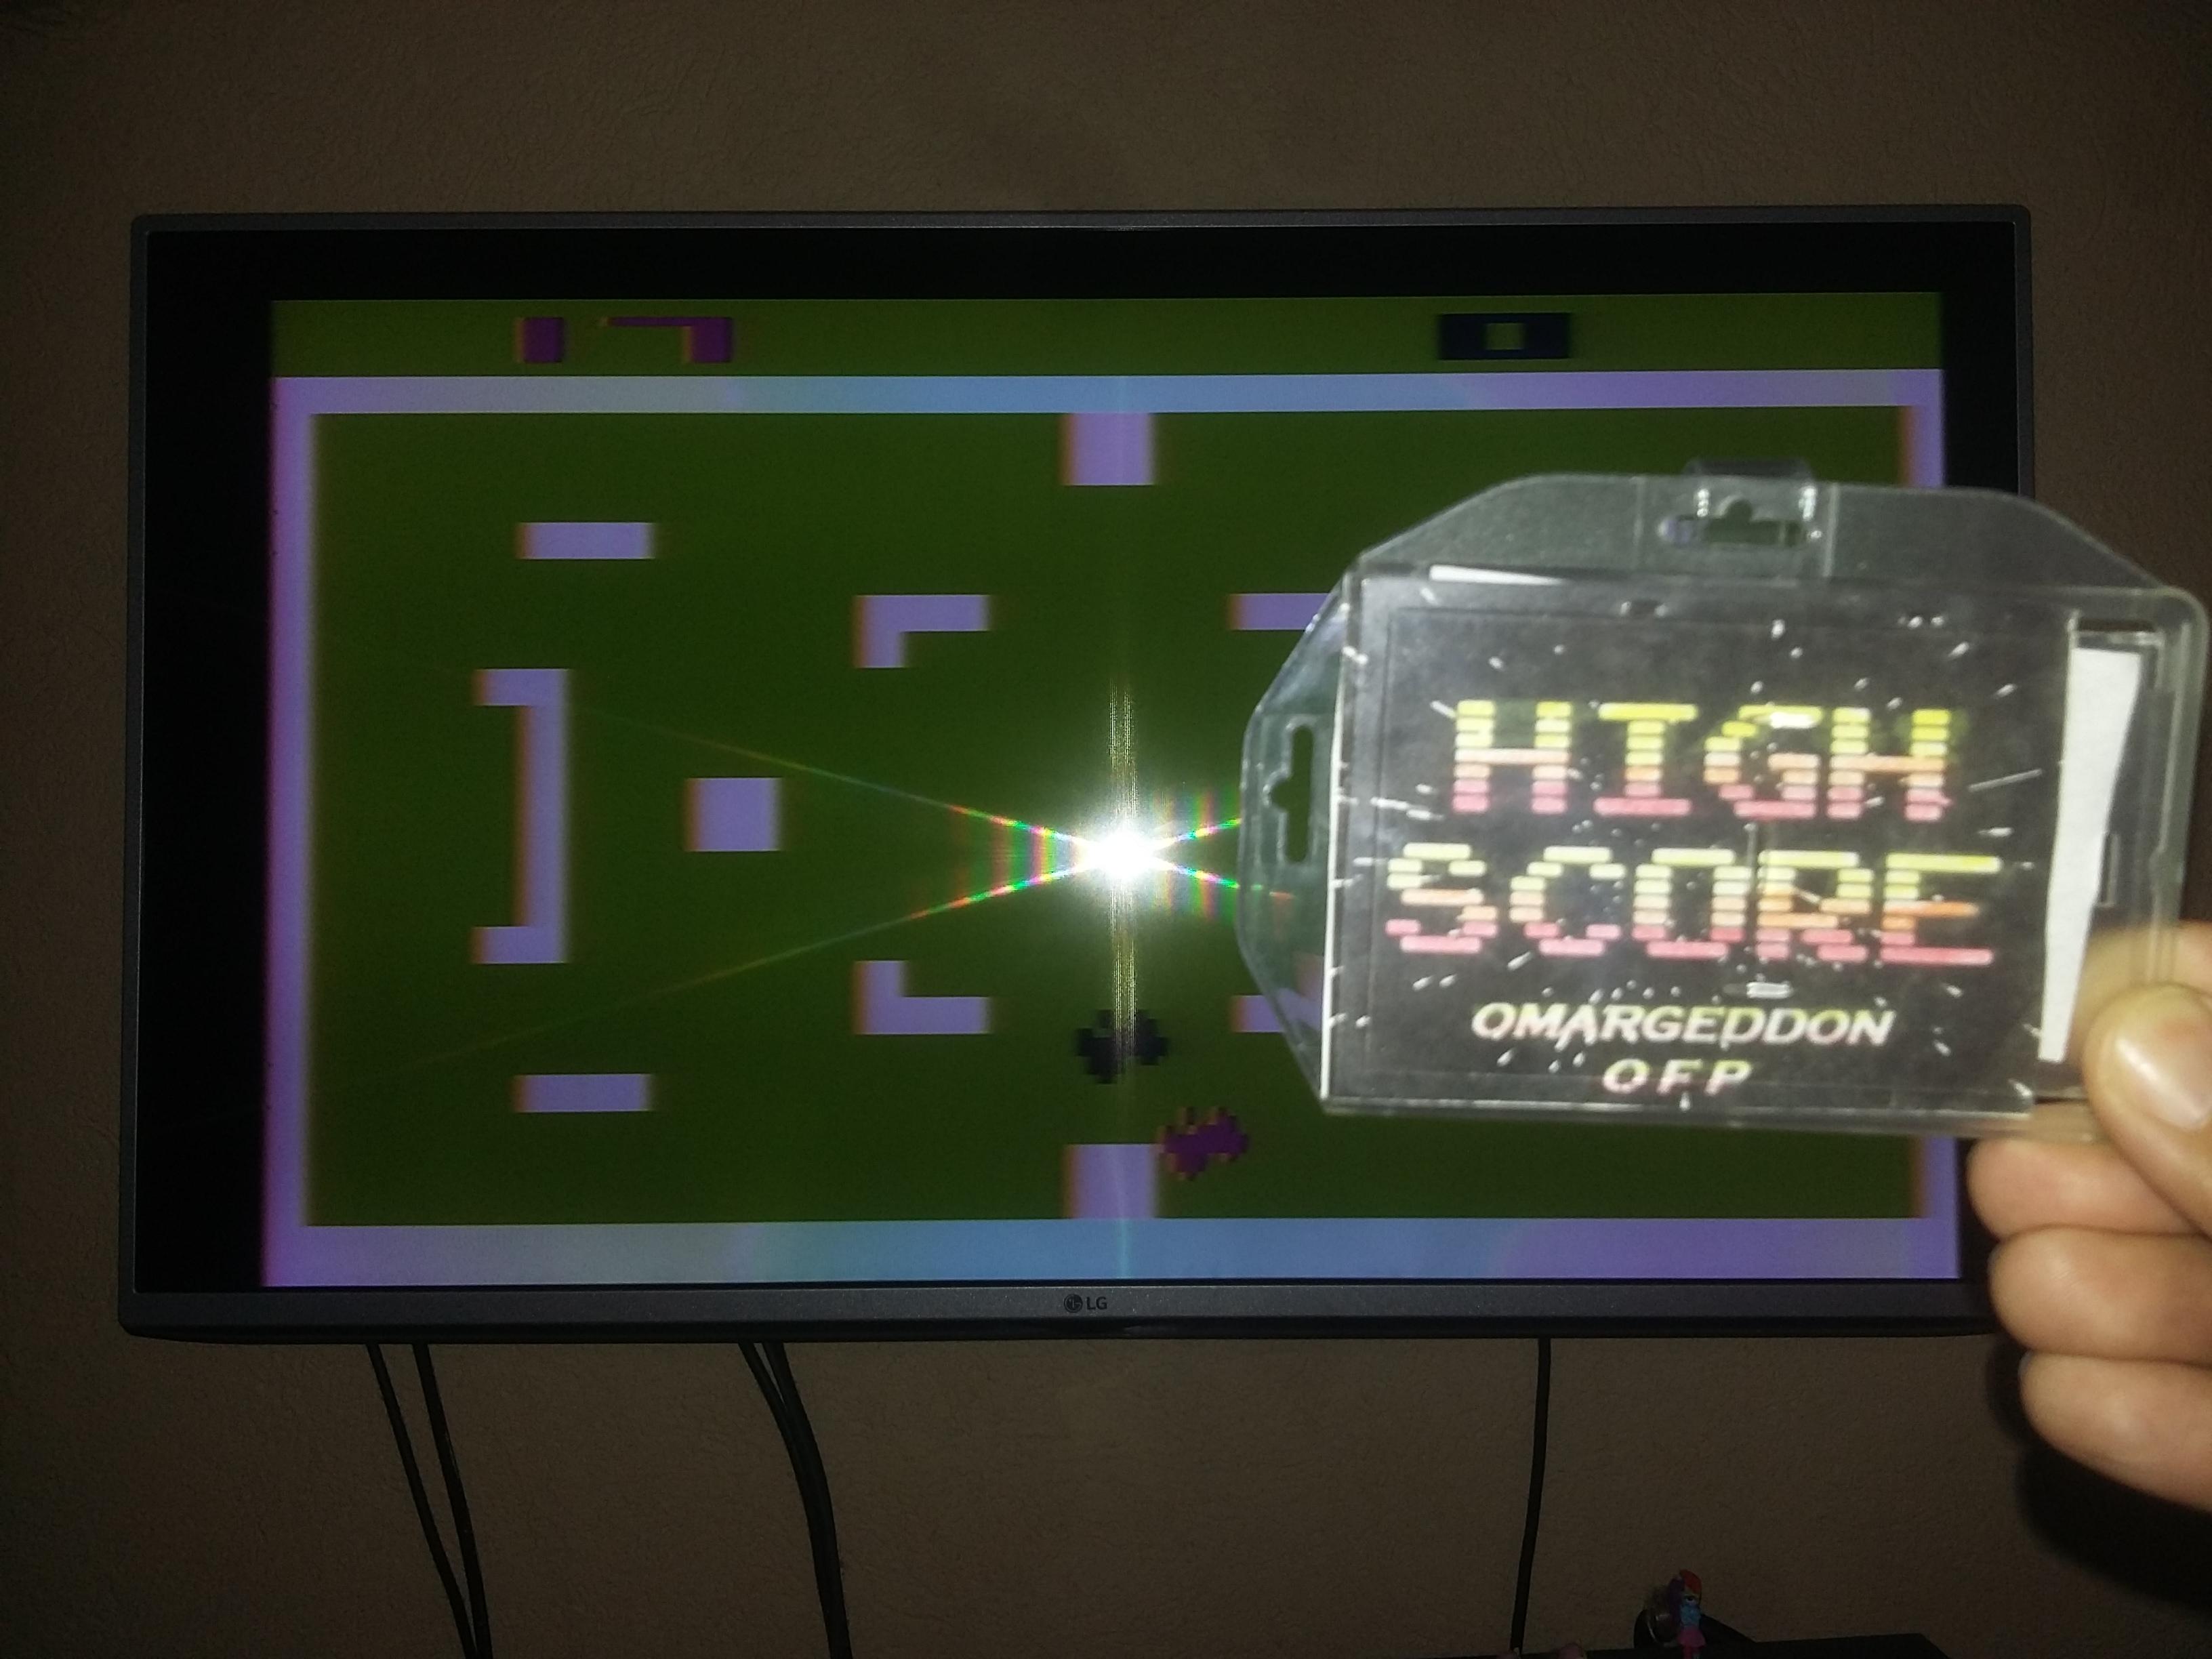 omargeddon: Combat: Game 4 (Atari 2600 Novice/B) 17 points on 2018-02-24 17:47:38